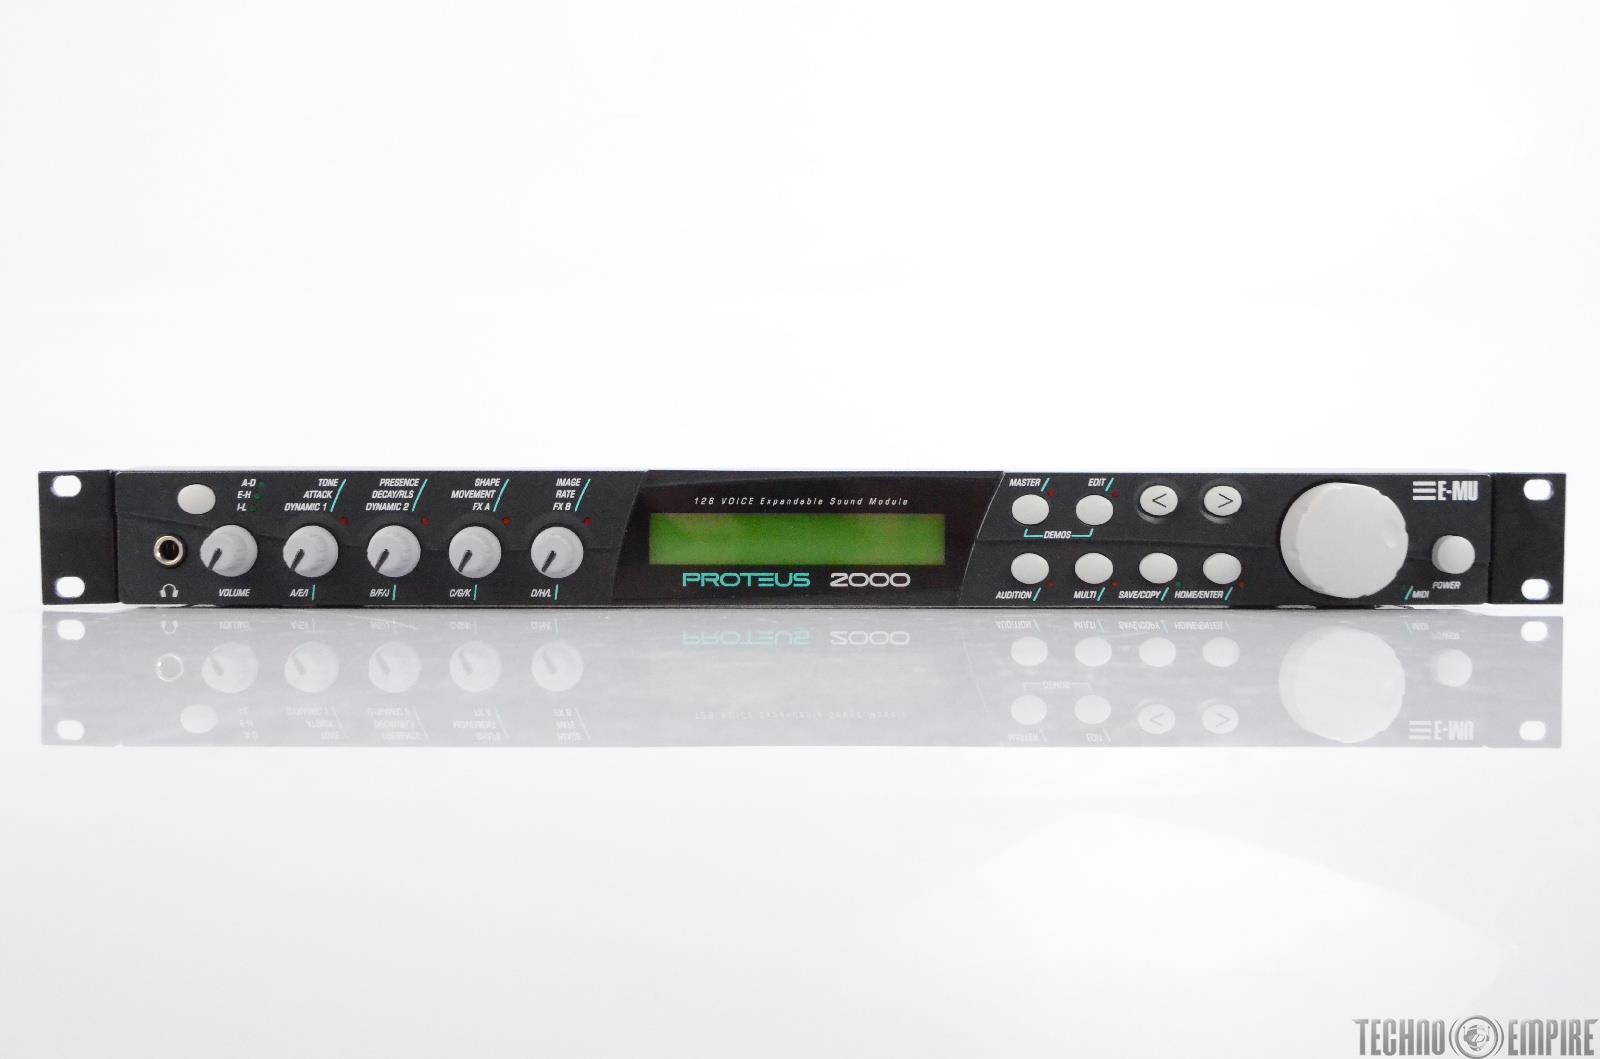 E-MU Proteus 2000 128 Voice Sound Module w/ World Protozoa B3 Cards #30610